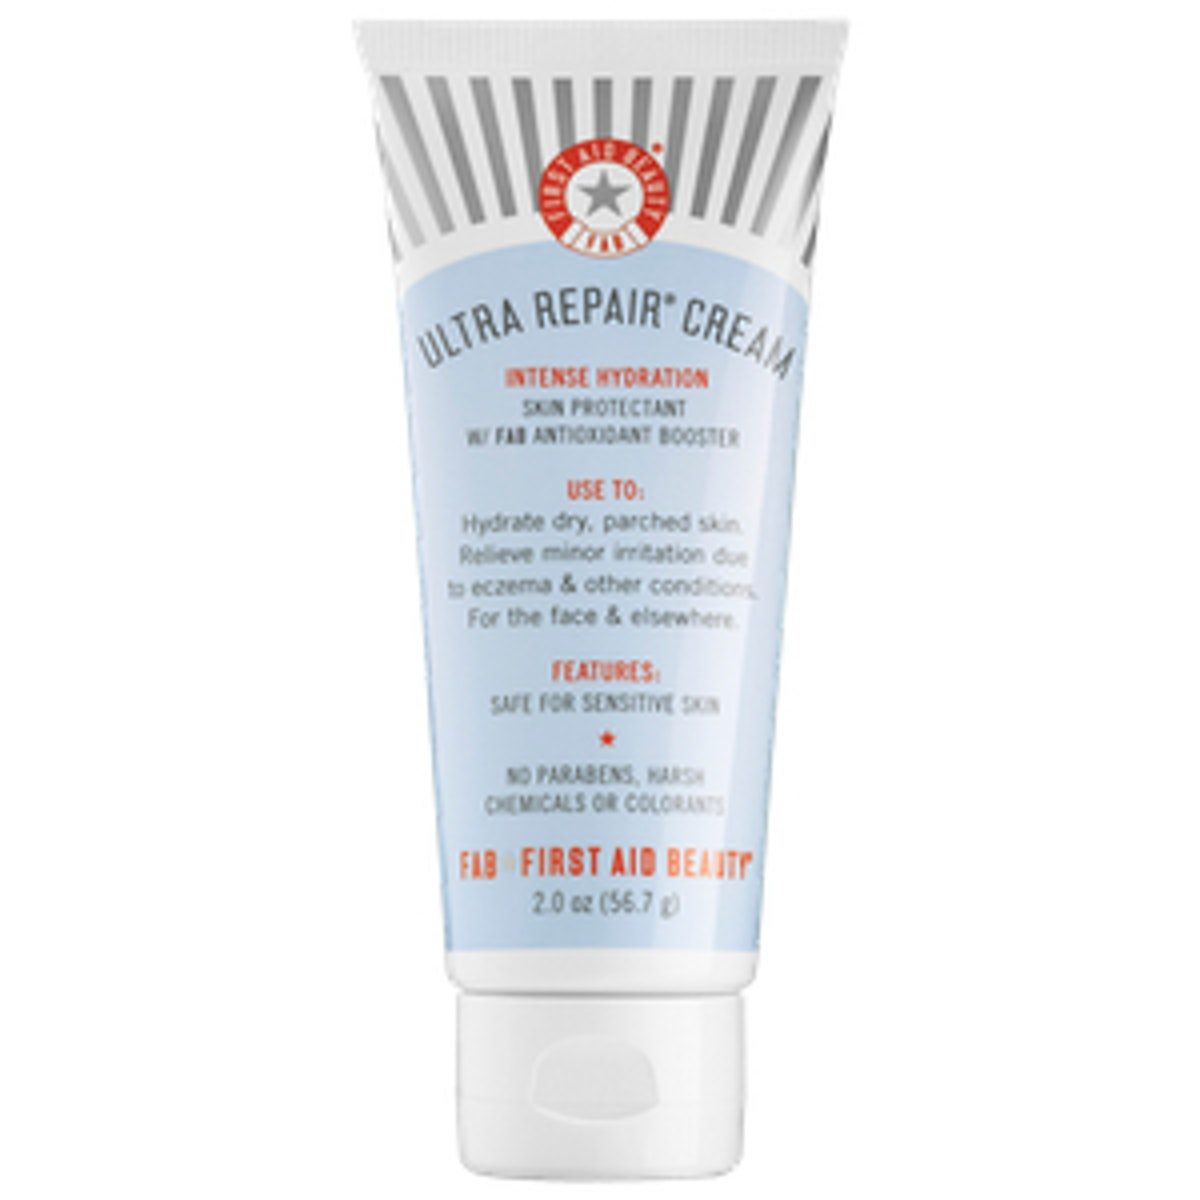 Ultra Repair Cream Intense